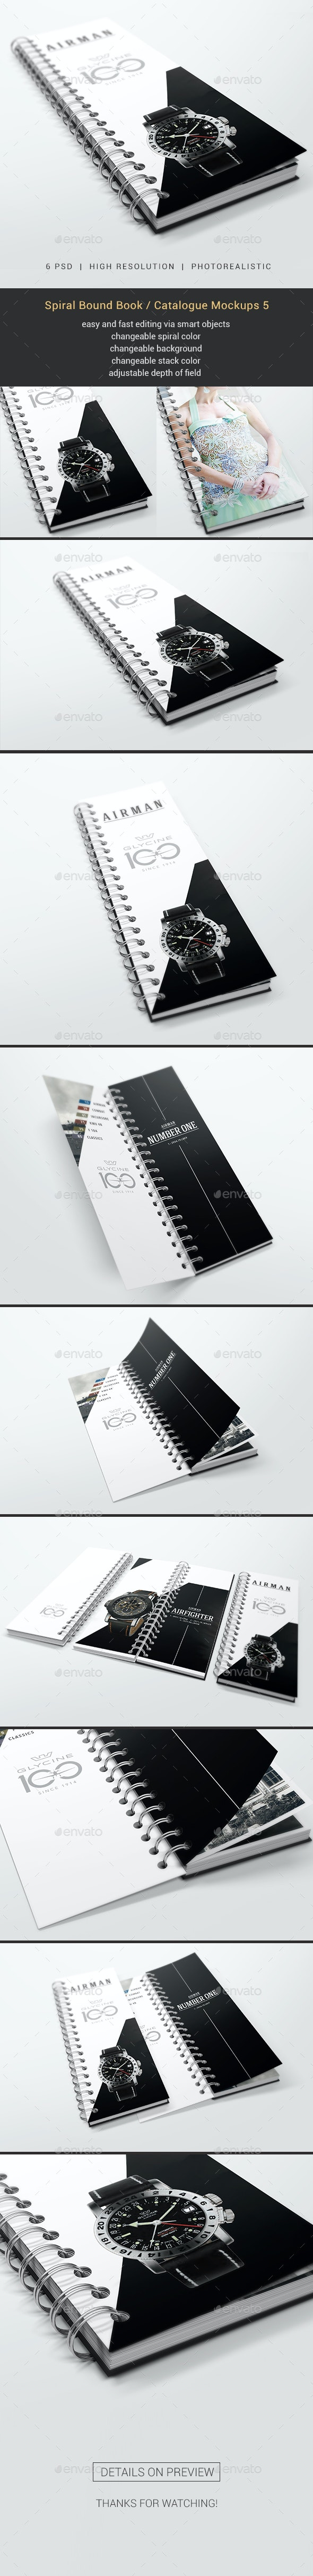 Spiral Bound Book / Catalogue Mockups 5 - Books Print